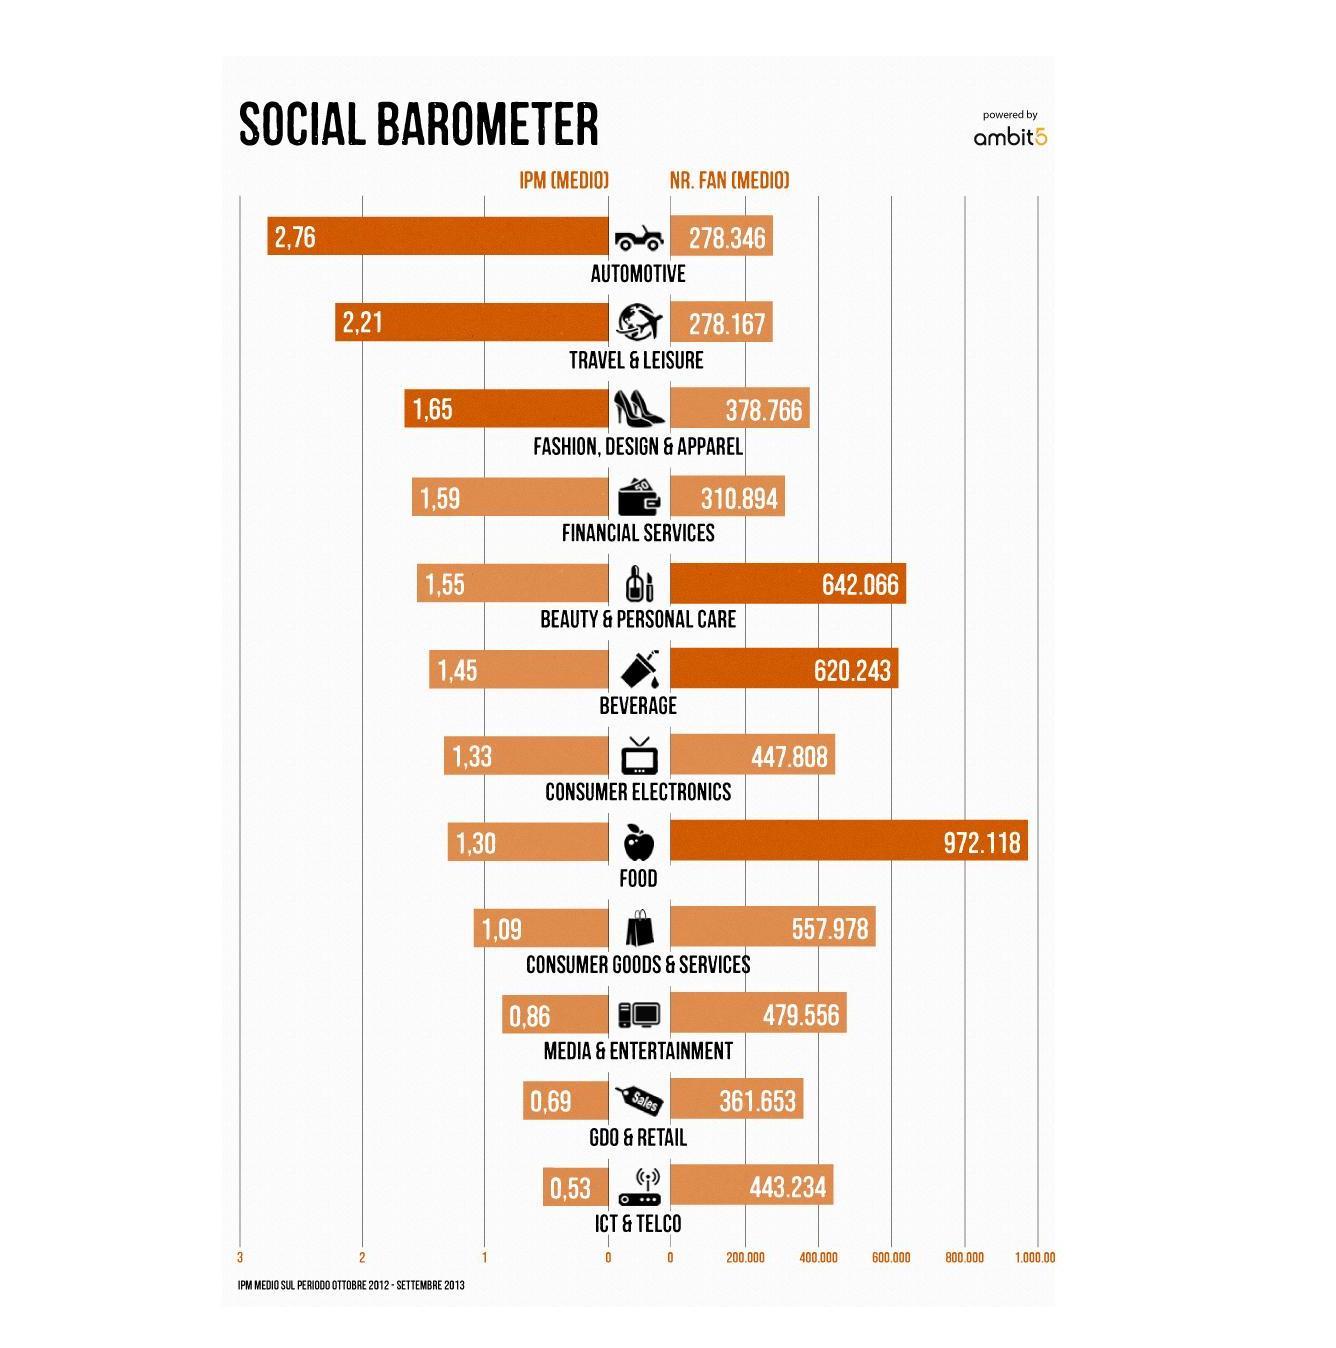 https://www.promotionmagazine.it/wp/wp-content/uploads/2013/11/Social-Barometer.jpg